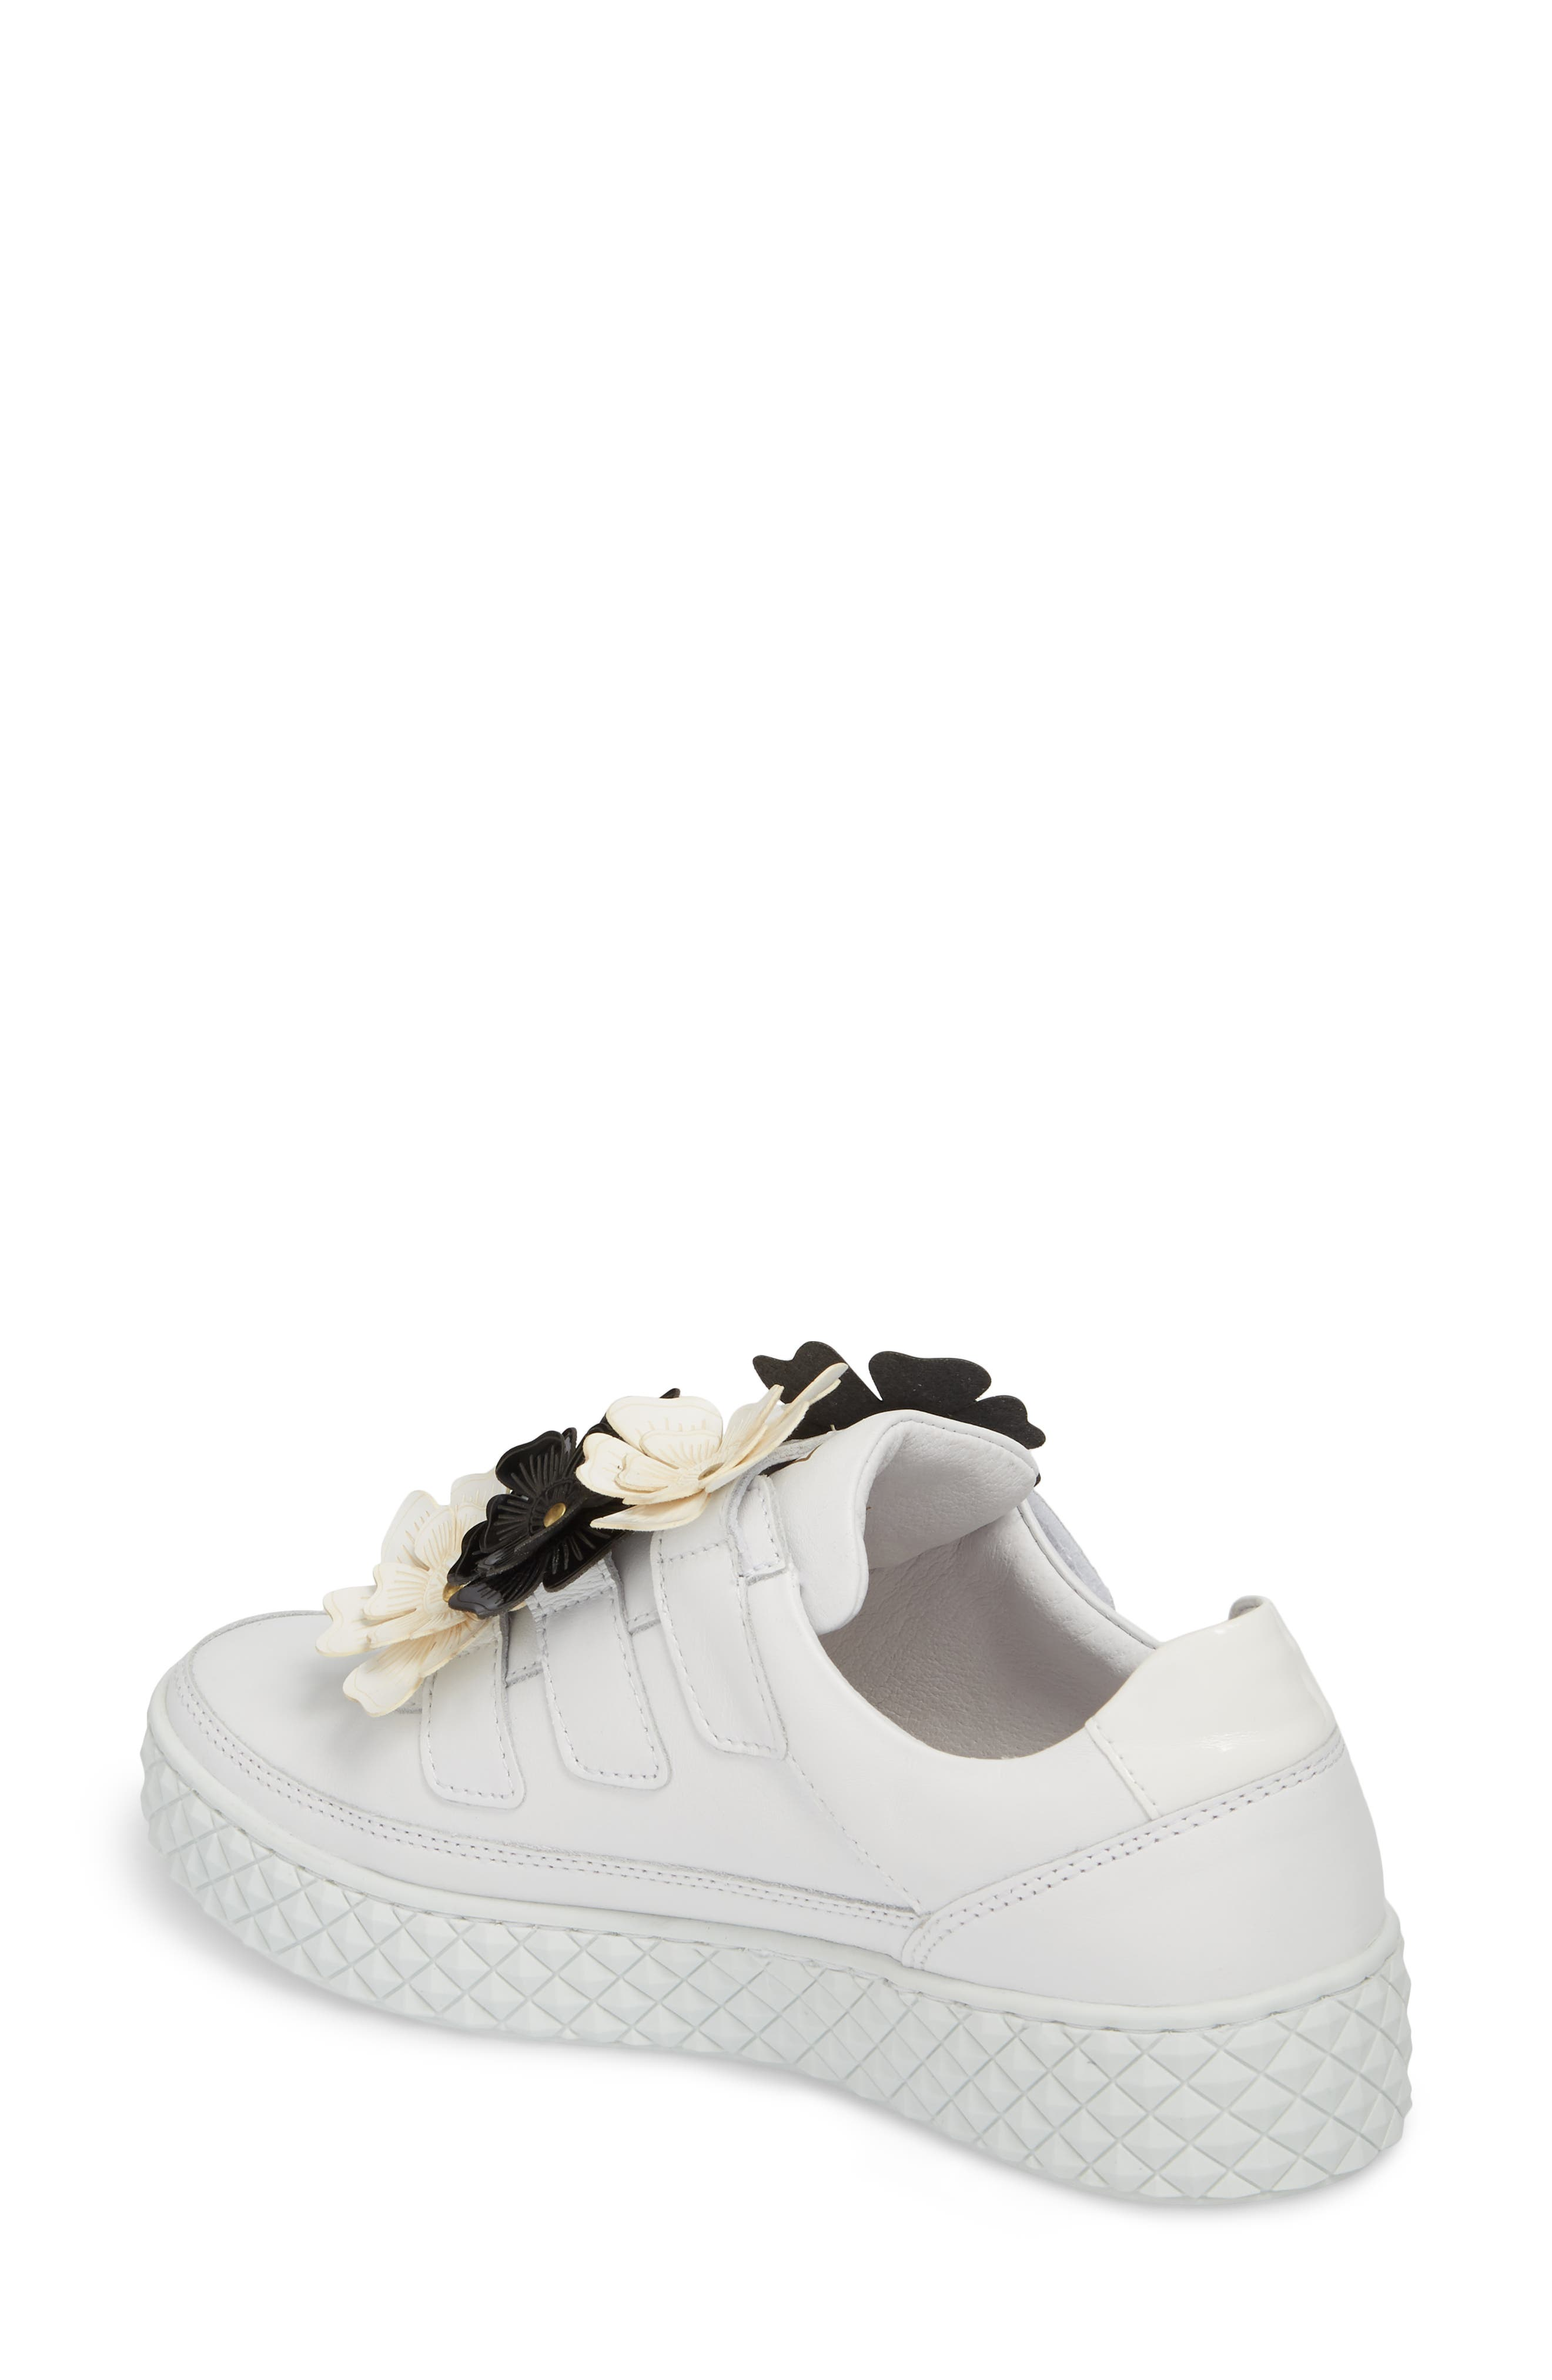 Hurou Embellished Sneaker,                             Alternate thumbnail 2, color,                             Optic White/ Black Leather